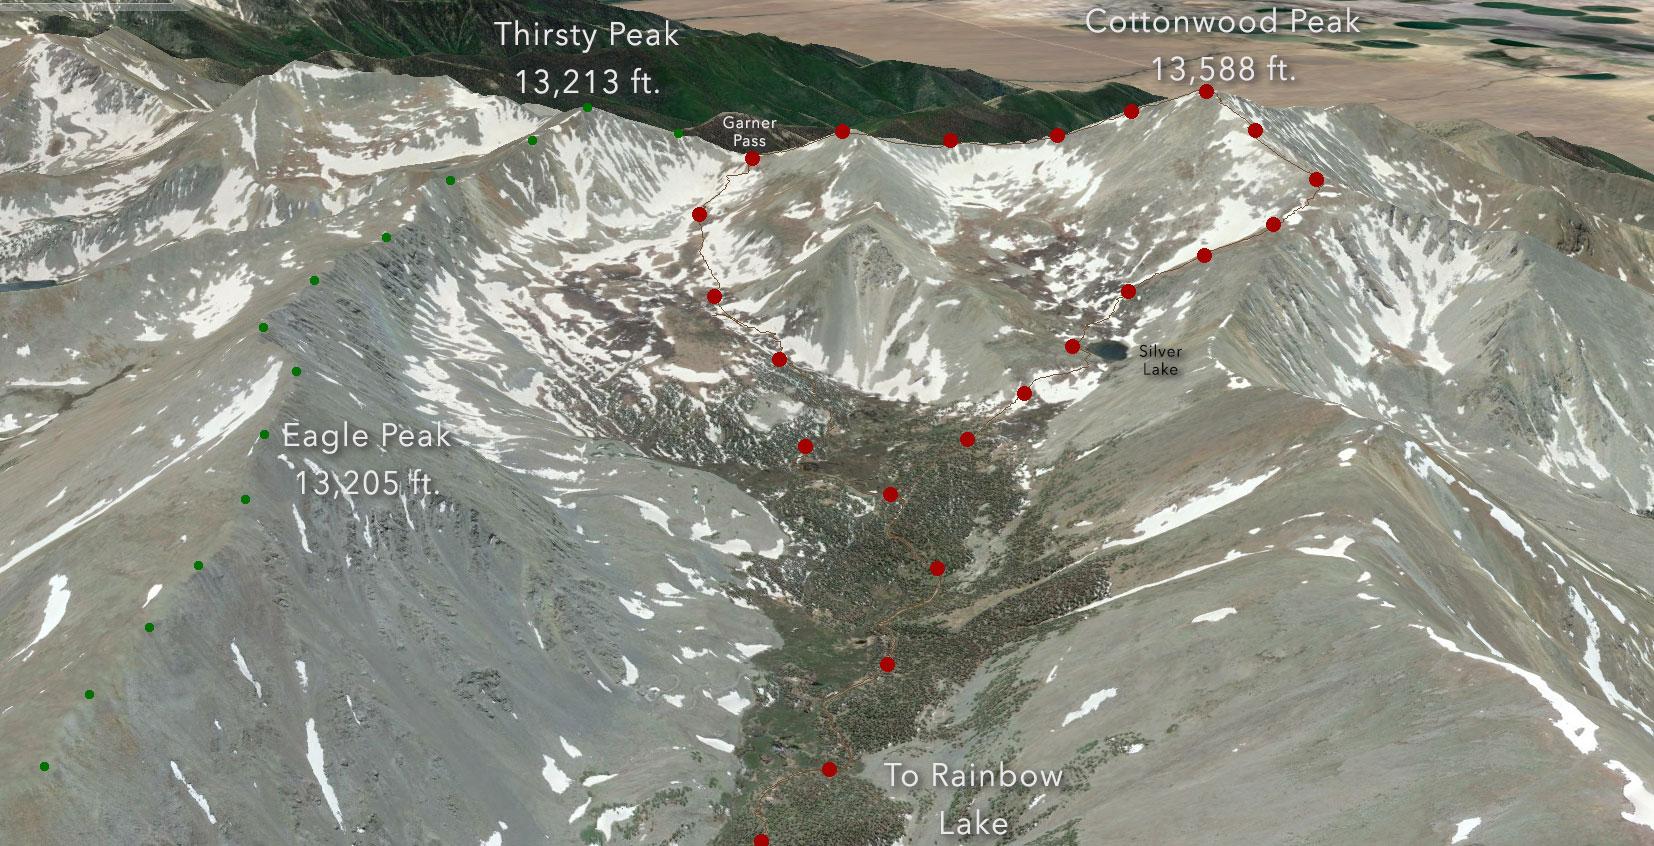 Google Earth overview of our Cottonwood Peak loop.